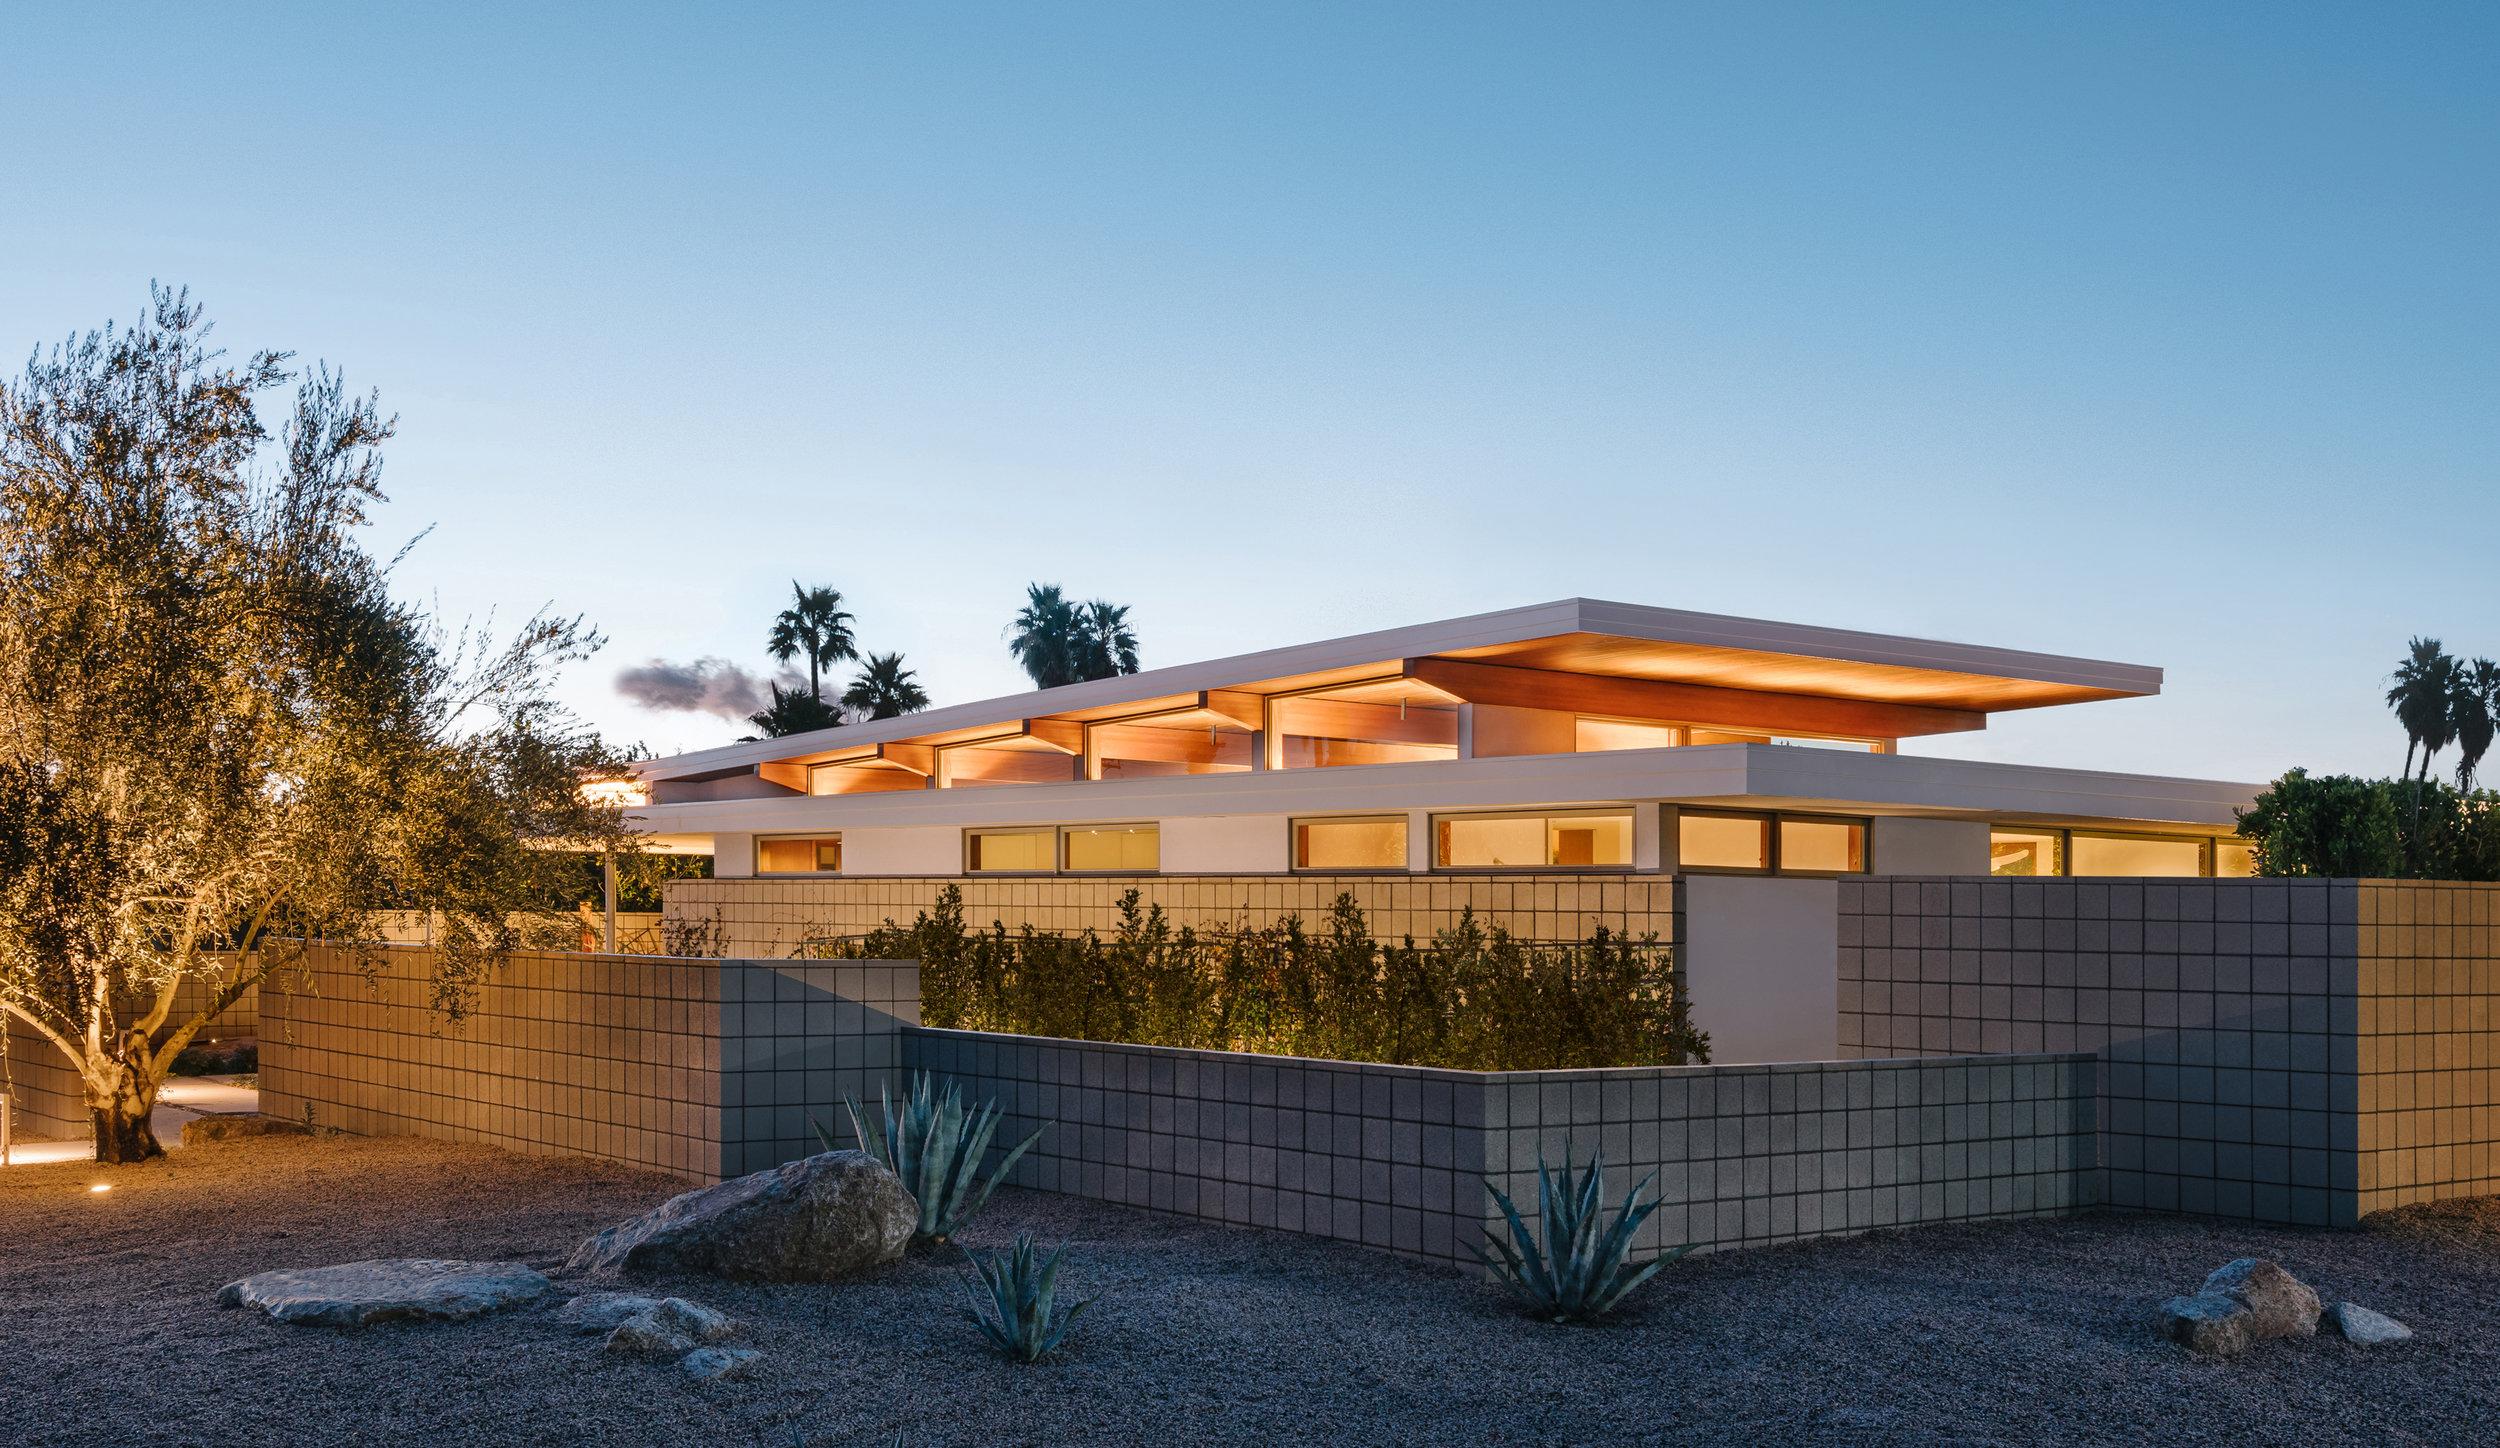 turkel_design_modern_prefab_home_axiom_desert_house_exterior_chasedaniel.jpg